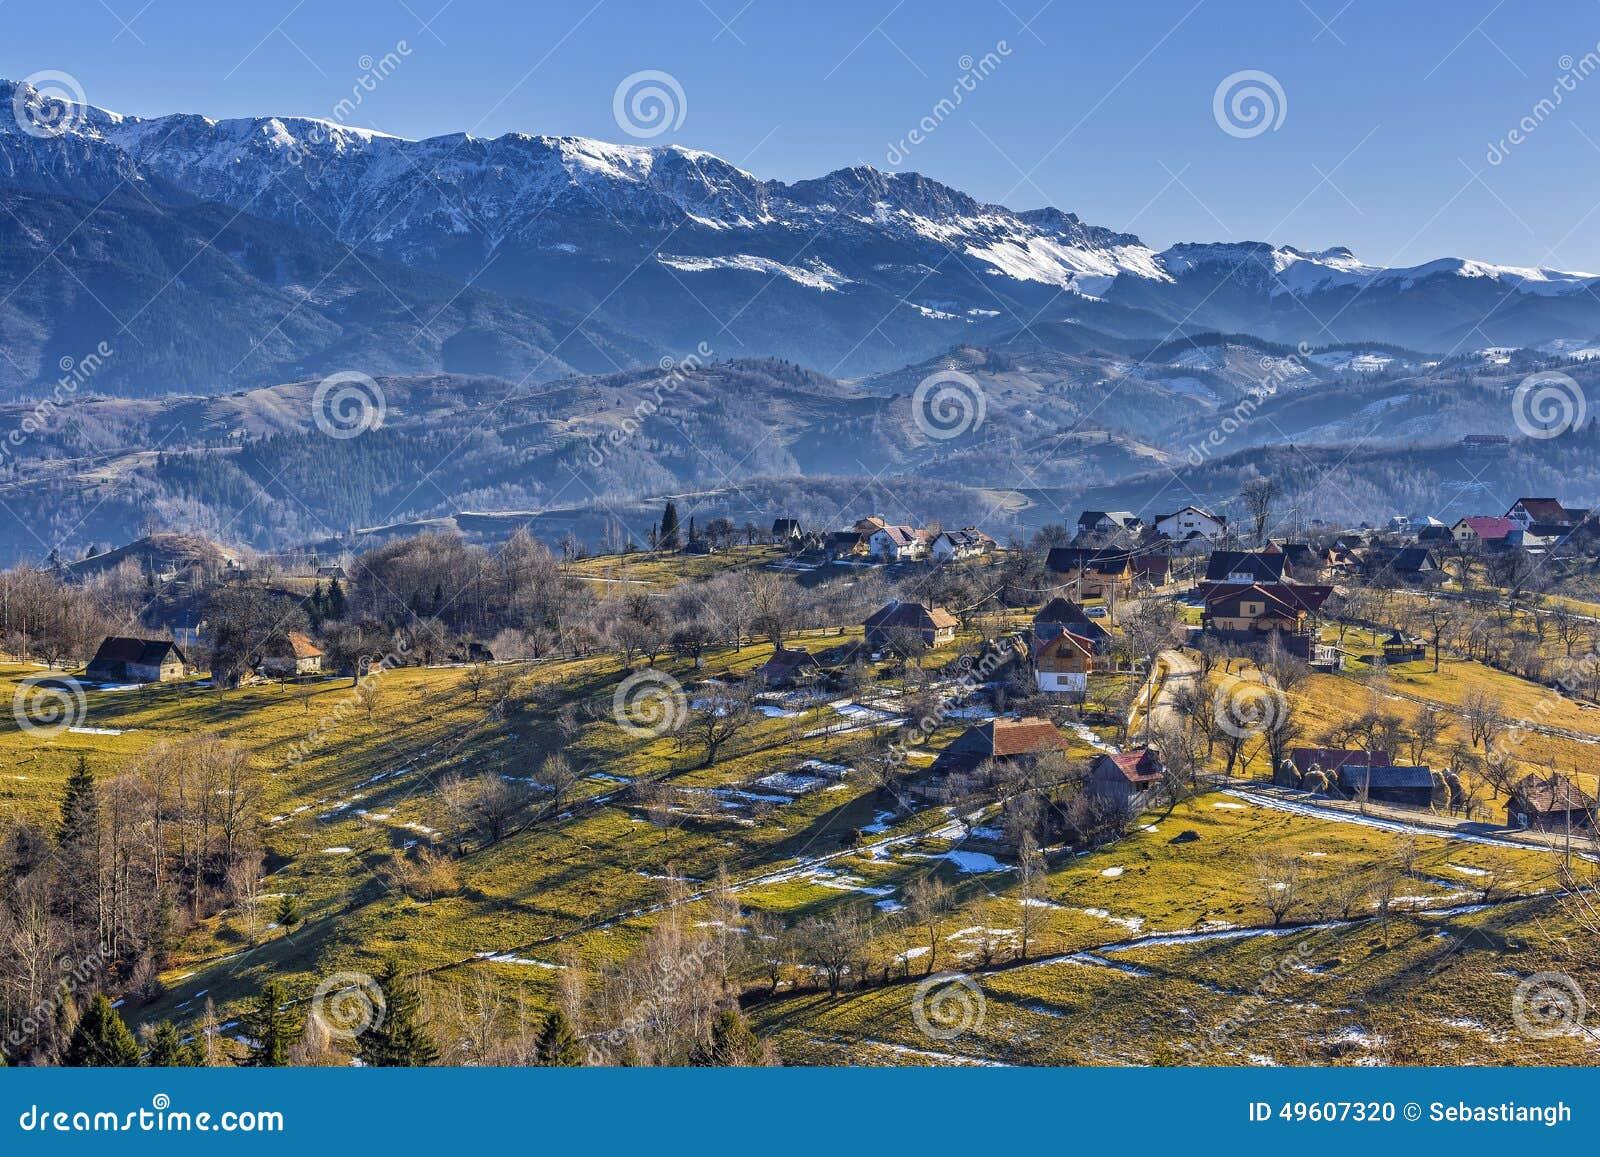 Countryside mountain landscape stock photo image 49607320 for Romania landscape